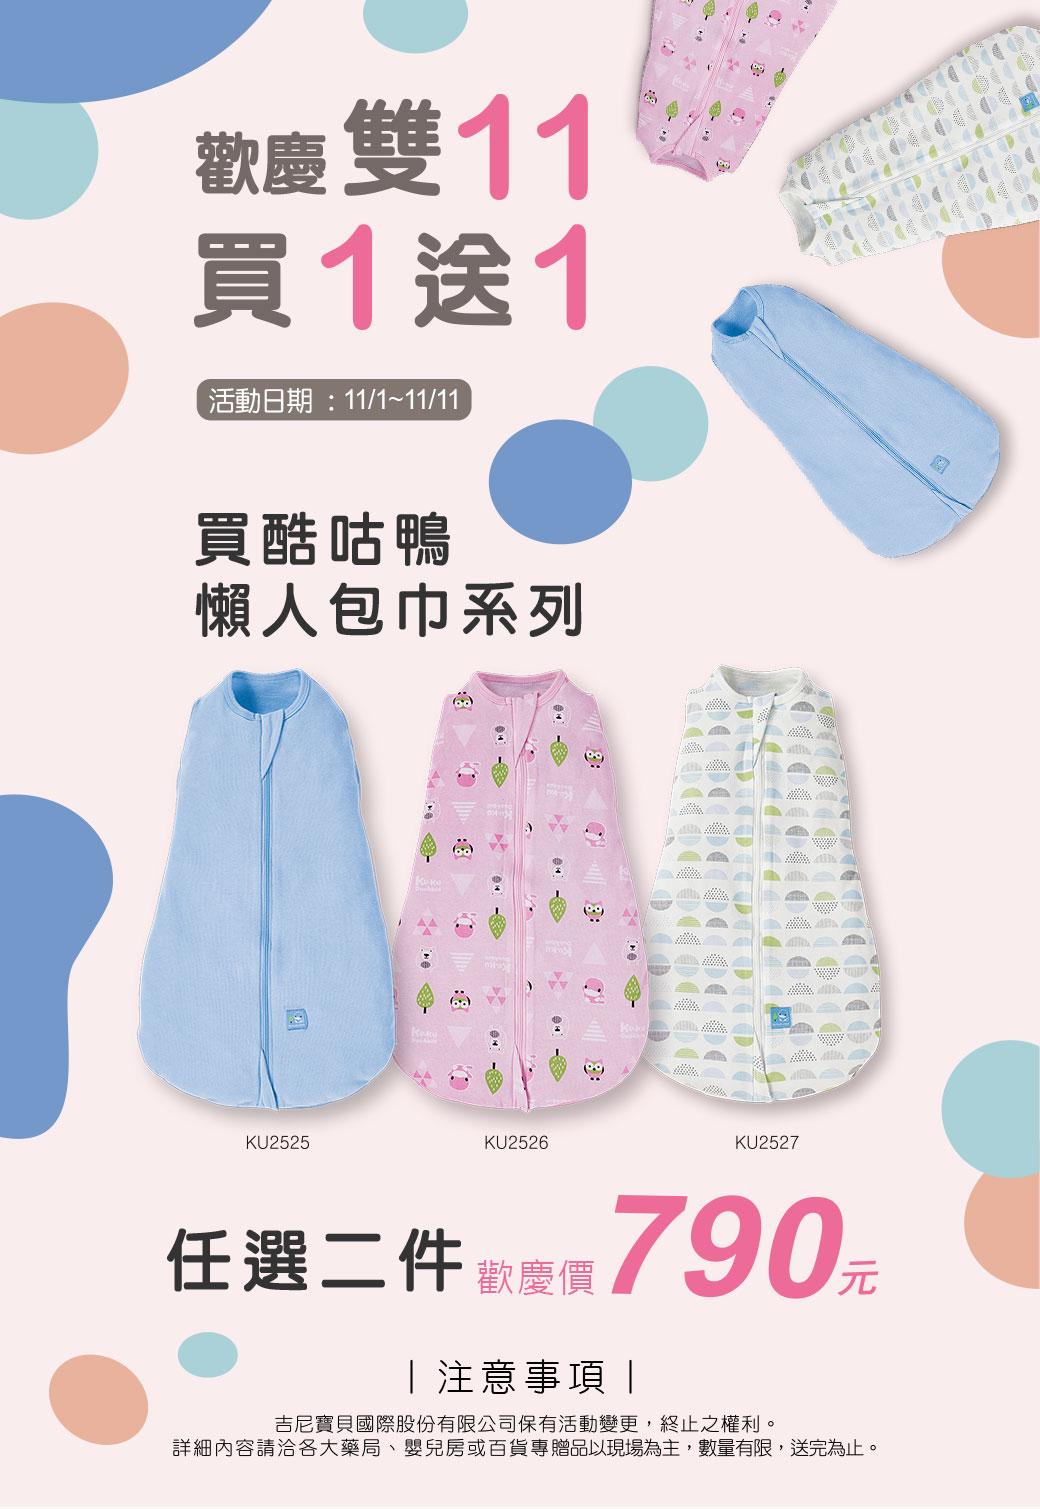 proimages/company/NEWS/20-years/1111/雙11活動頁面-1.jpg